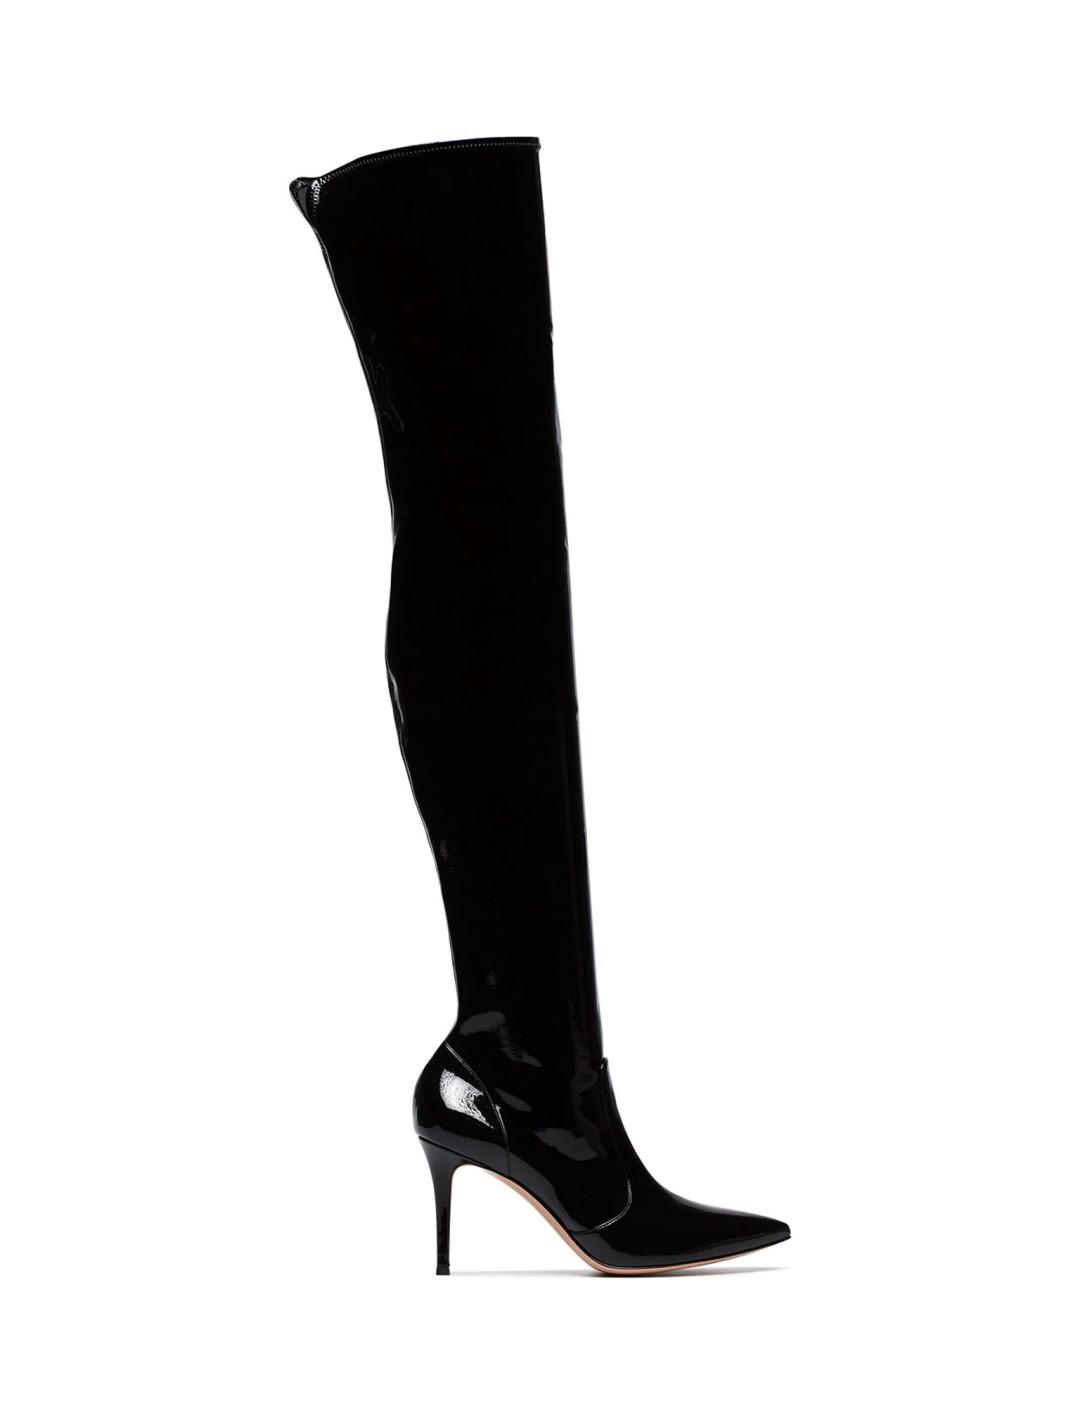 Black Vinyl Boots Shoes Gianvito Rossi